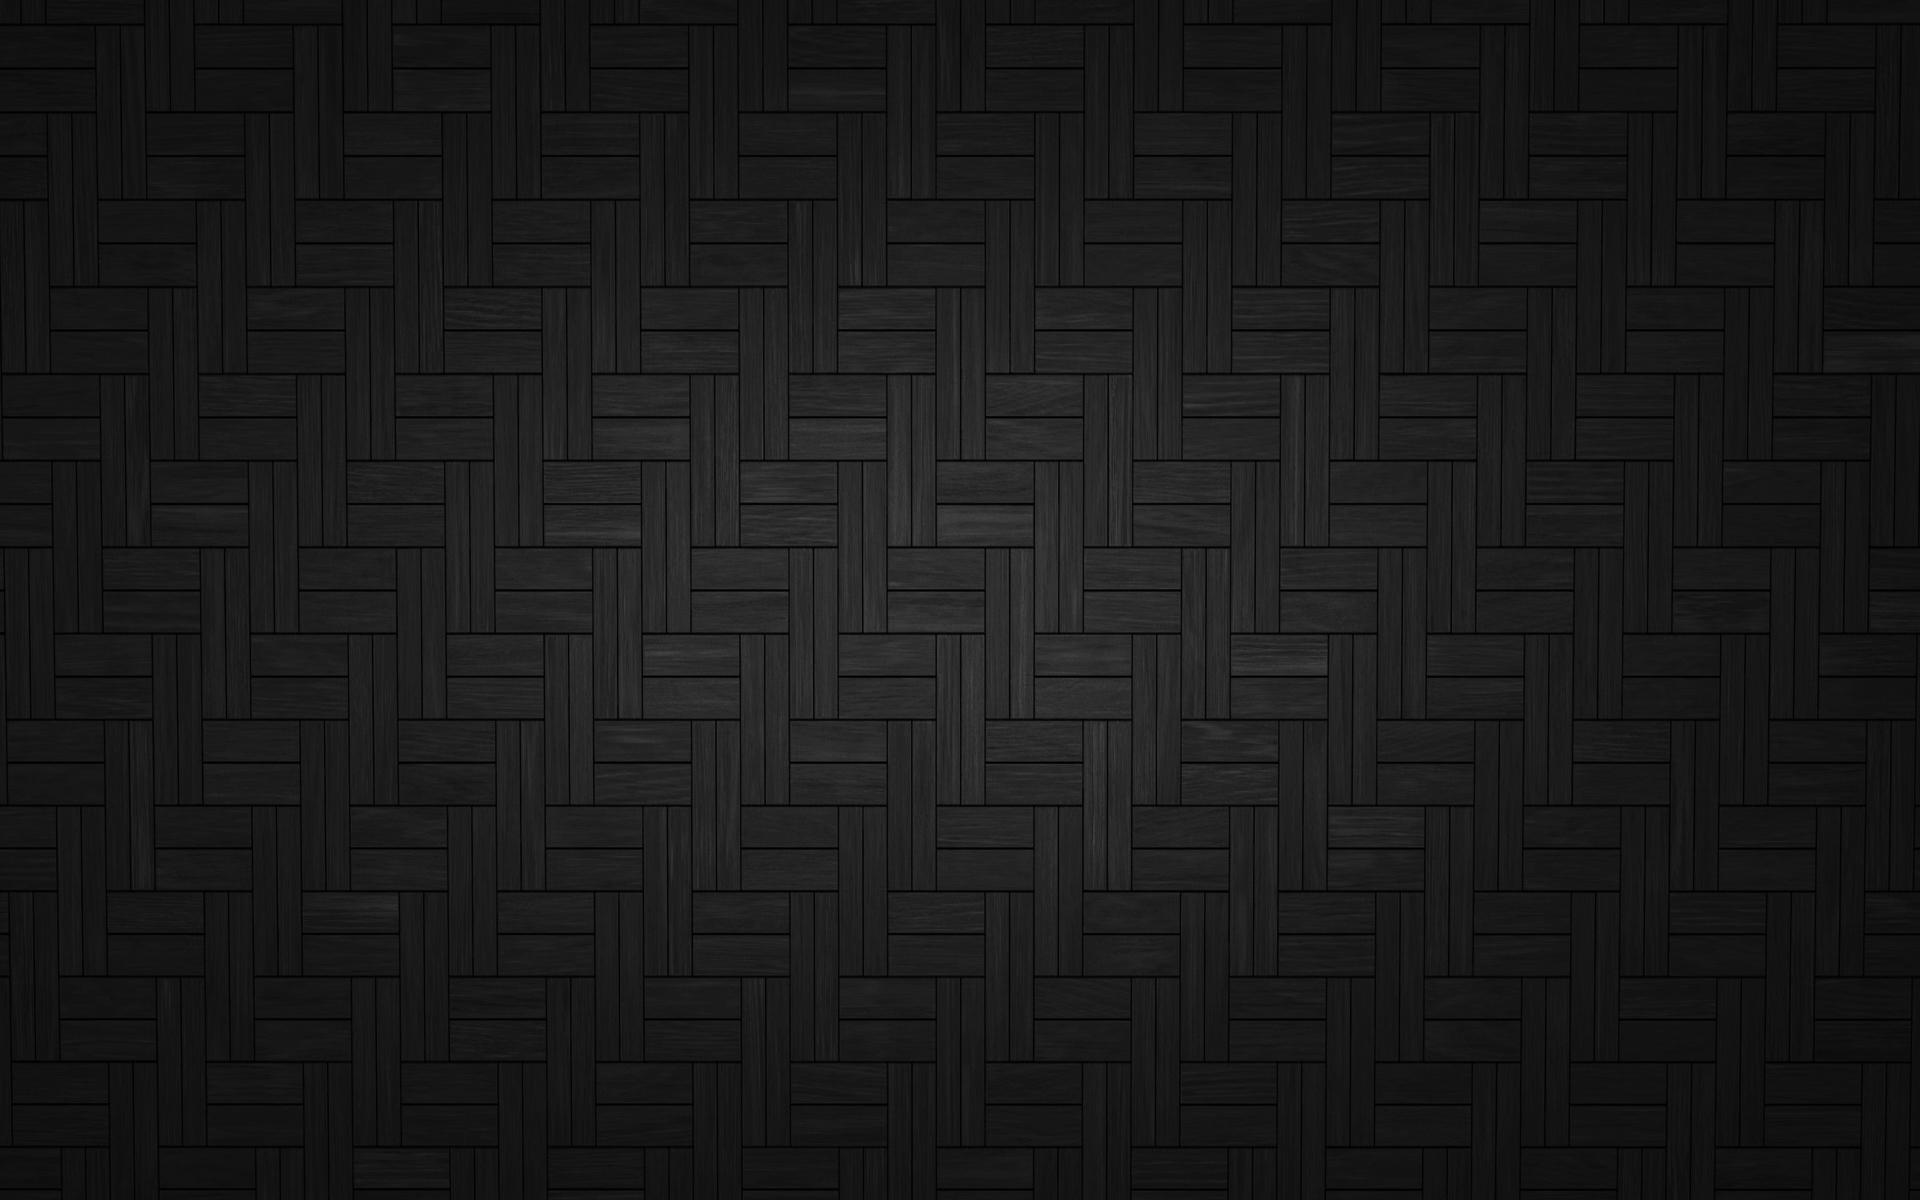 Black Wallpaper 10 1920x1200